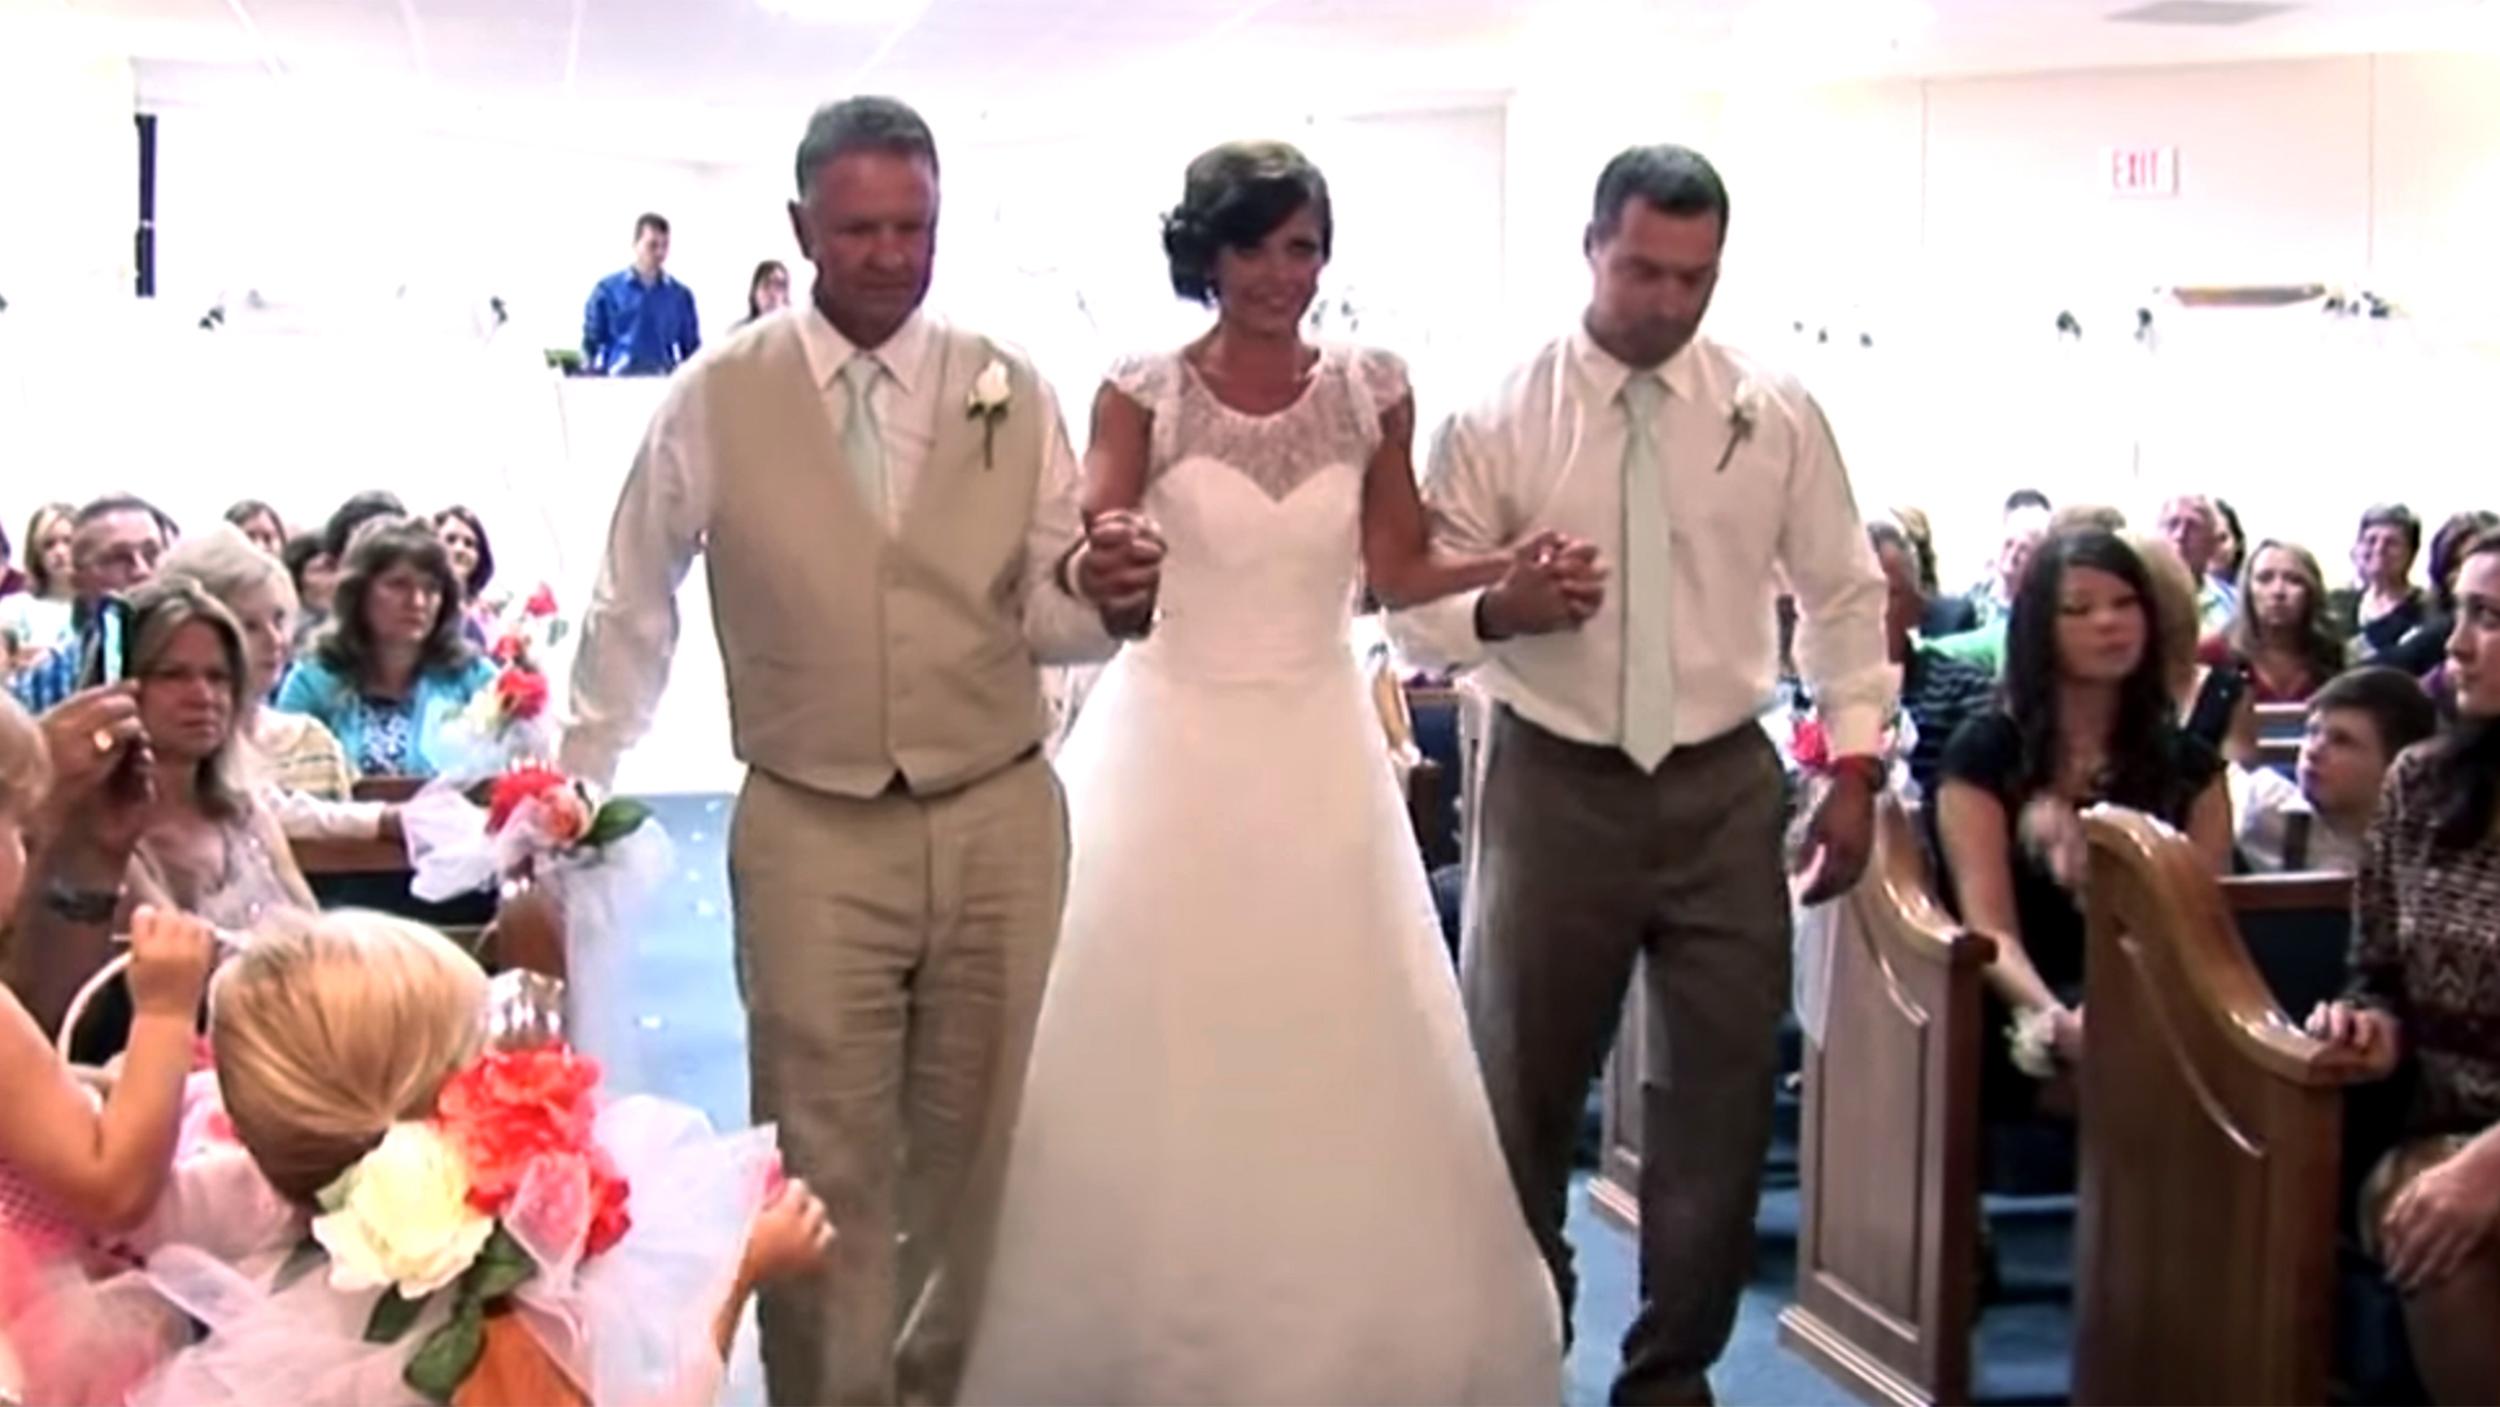 Louisiana bride paralyzed in car crash learns to walk down